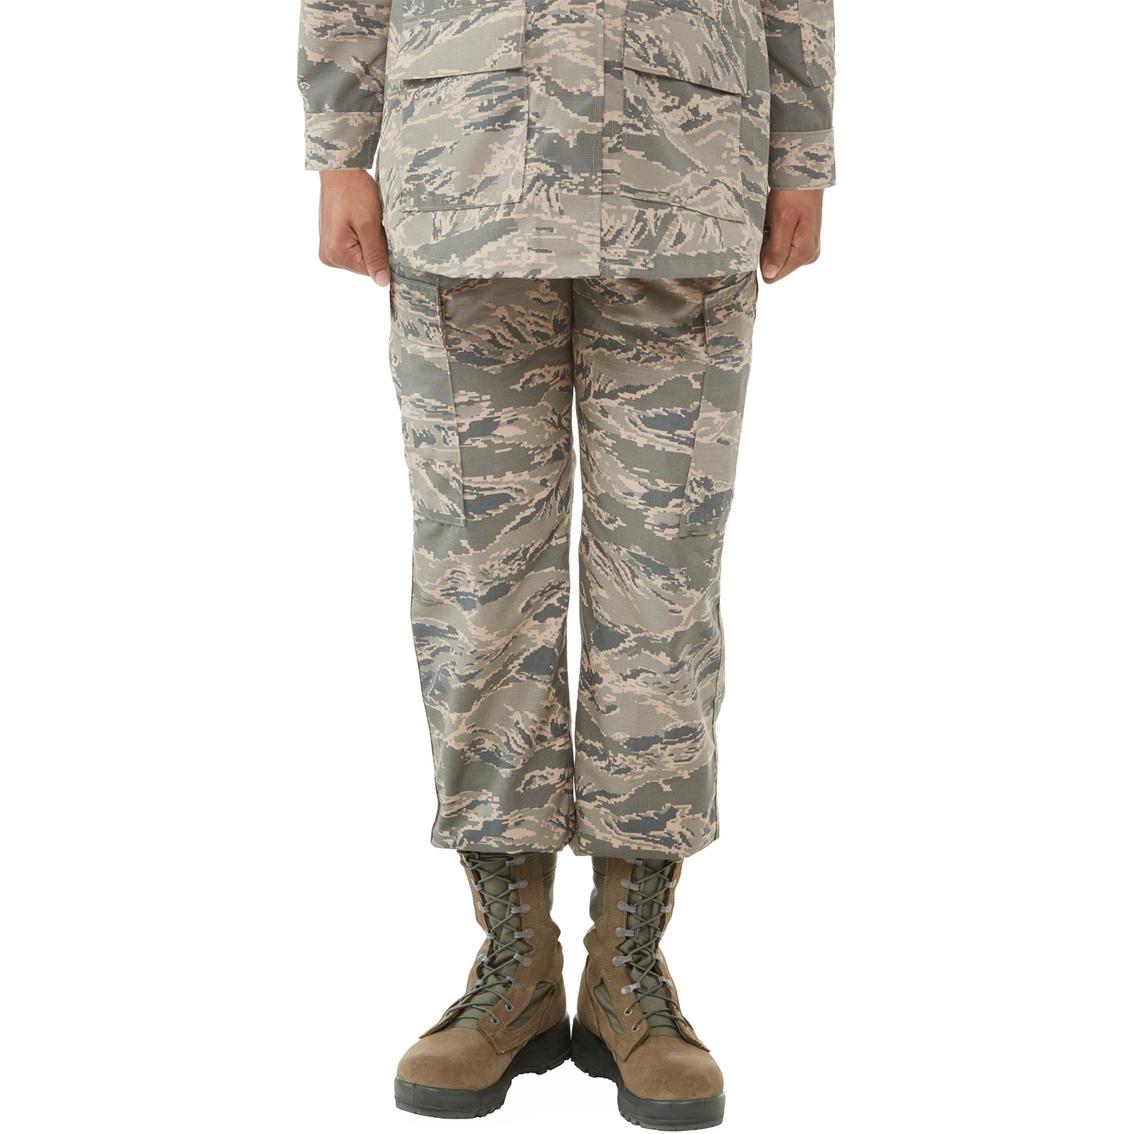 3eff63a130f Dlats Air Force Maternity Airman Battle Uniform (mabu) Slacks ...